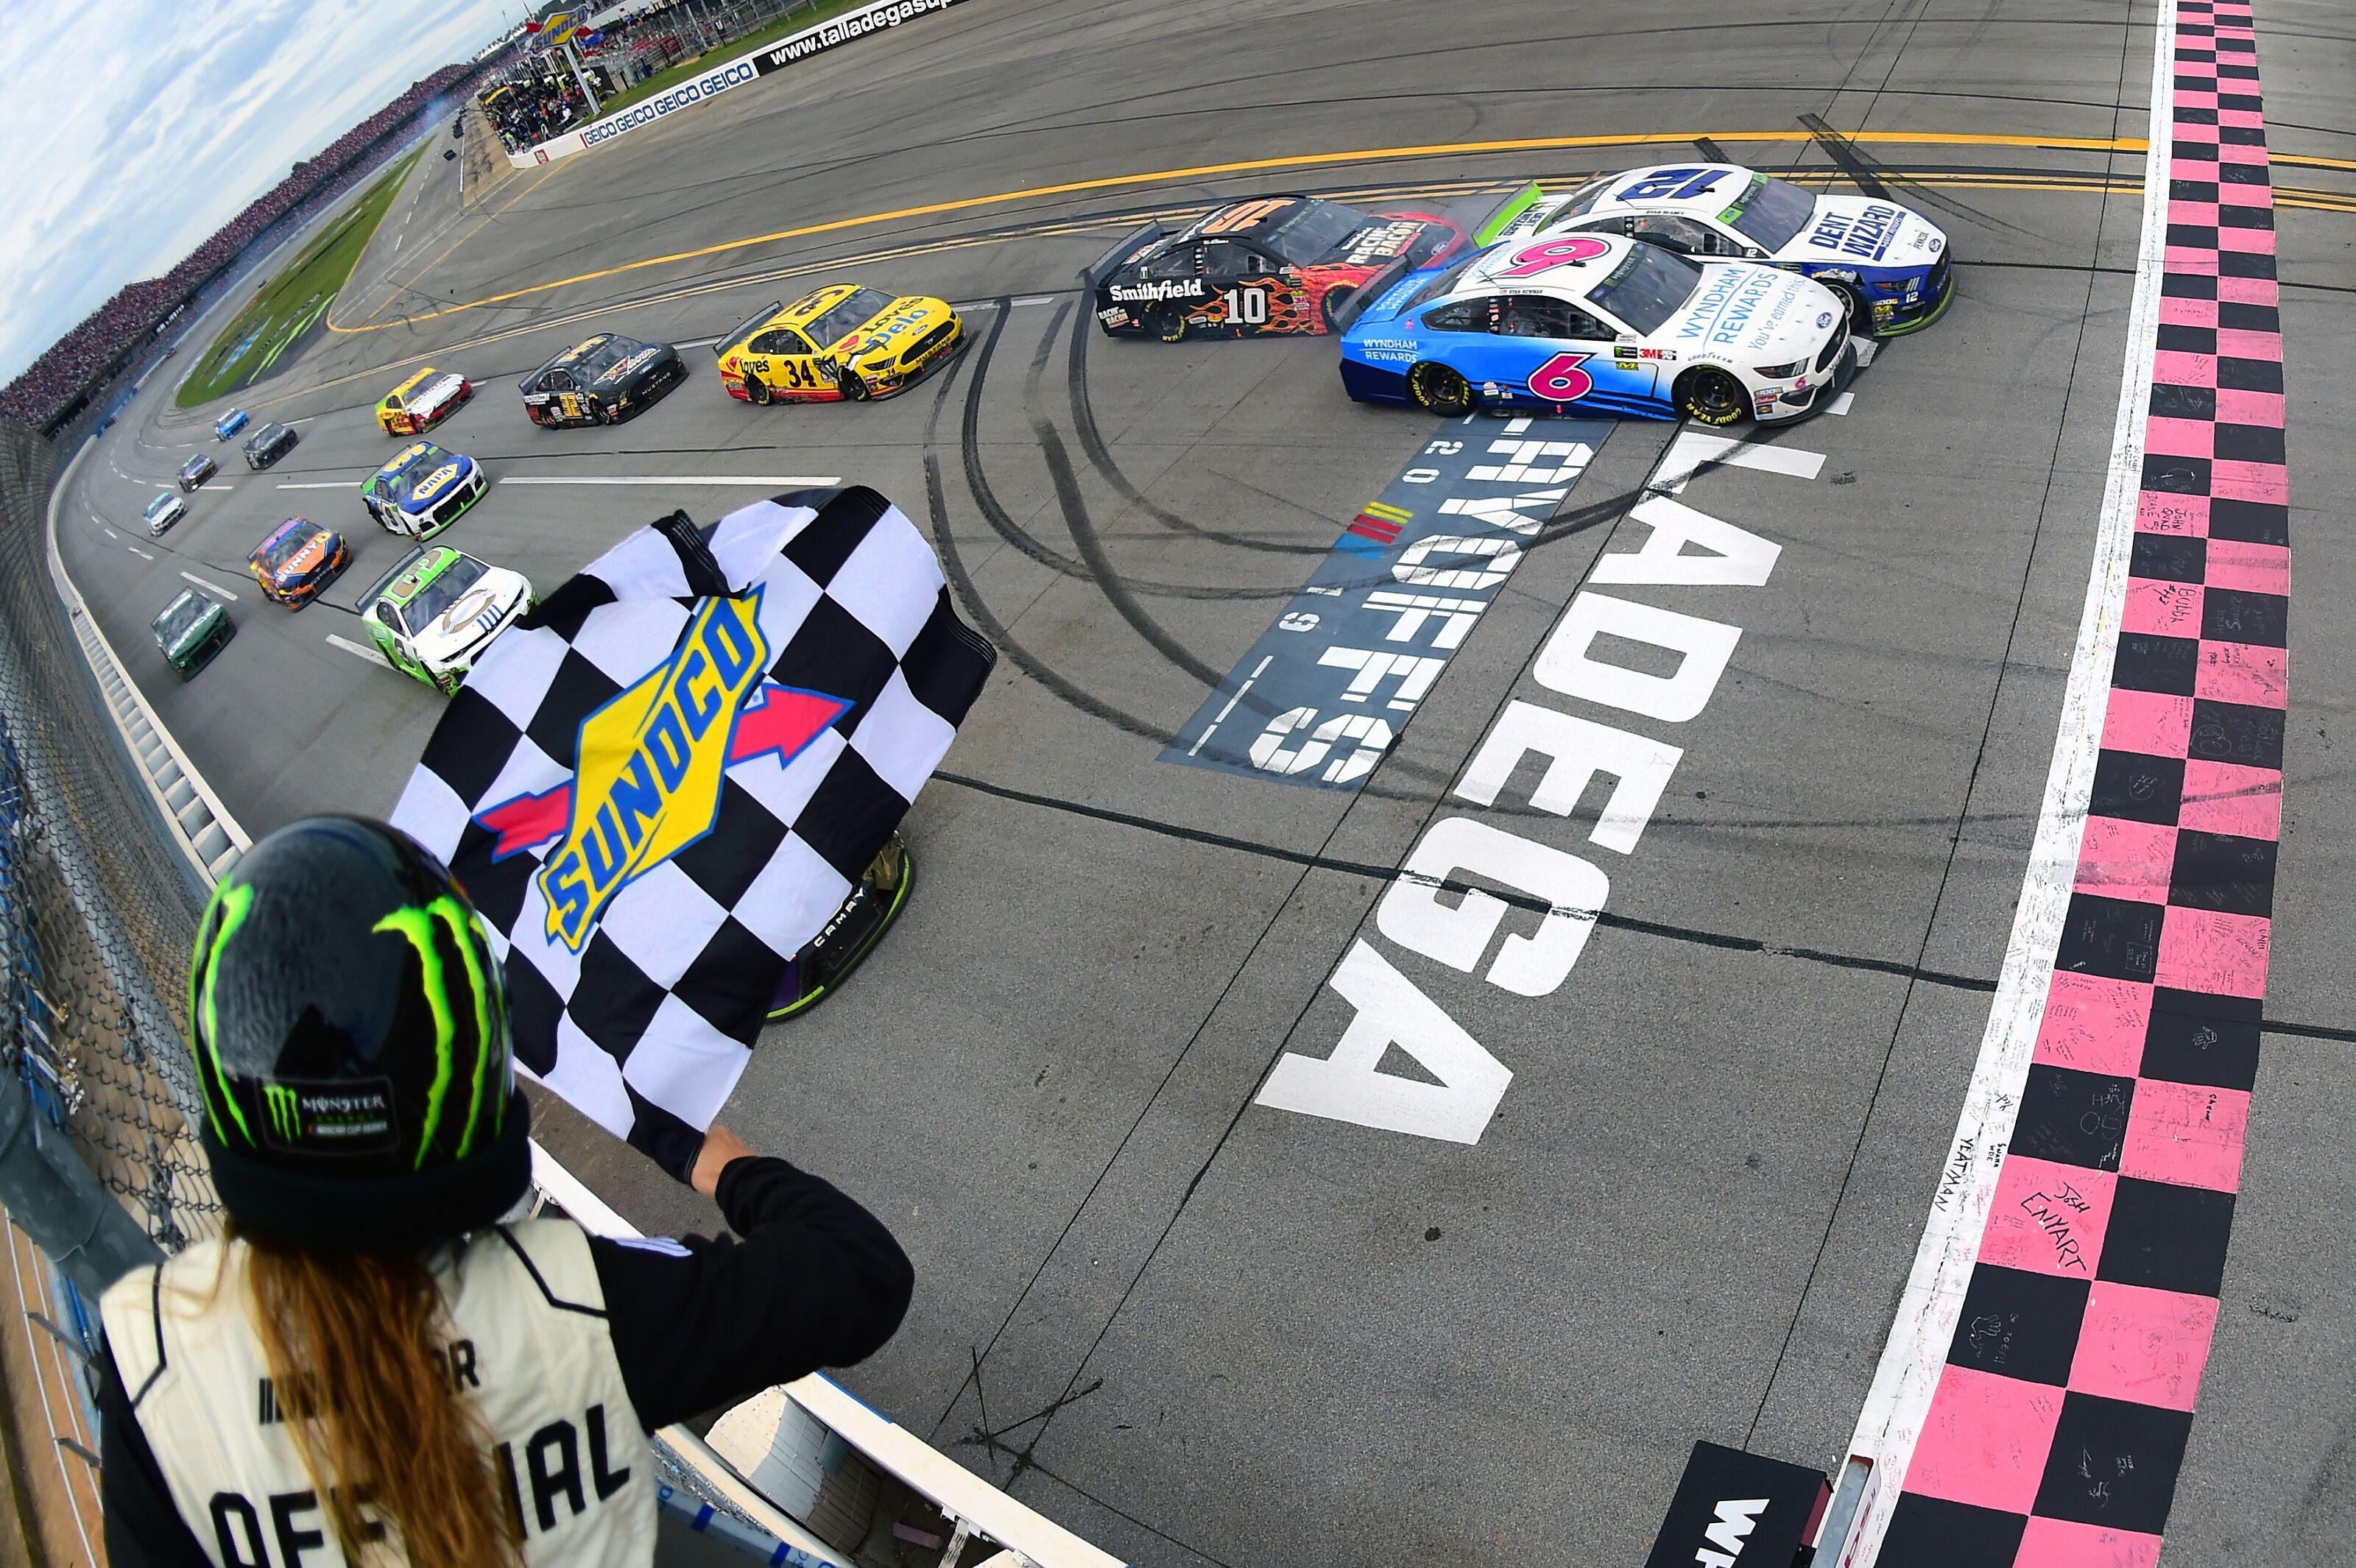 NASCAR Cup Series: Ryan Blaney wins 2019 1000Bulbs.com 500 in photo finish